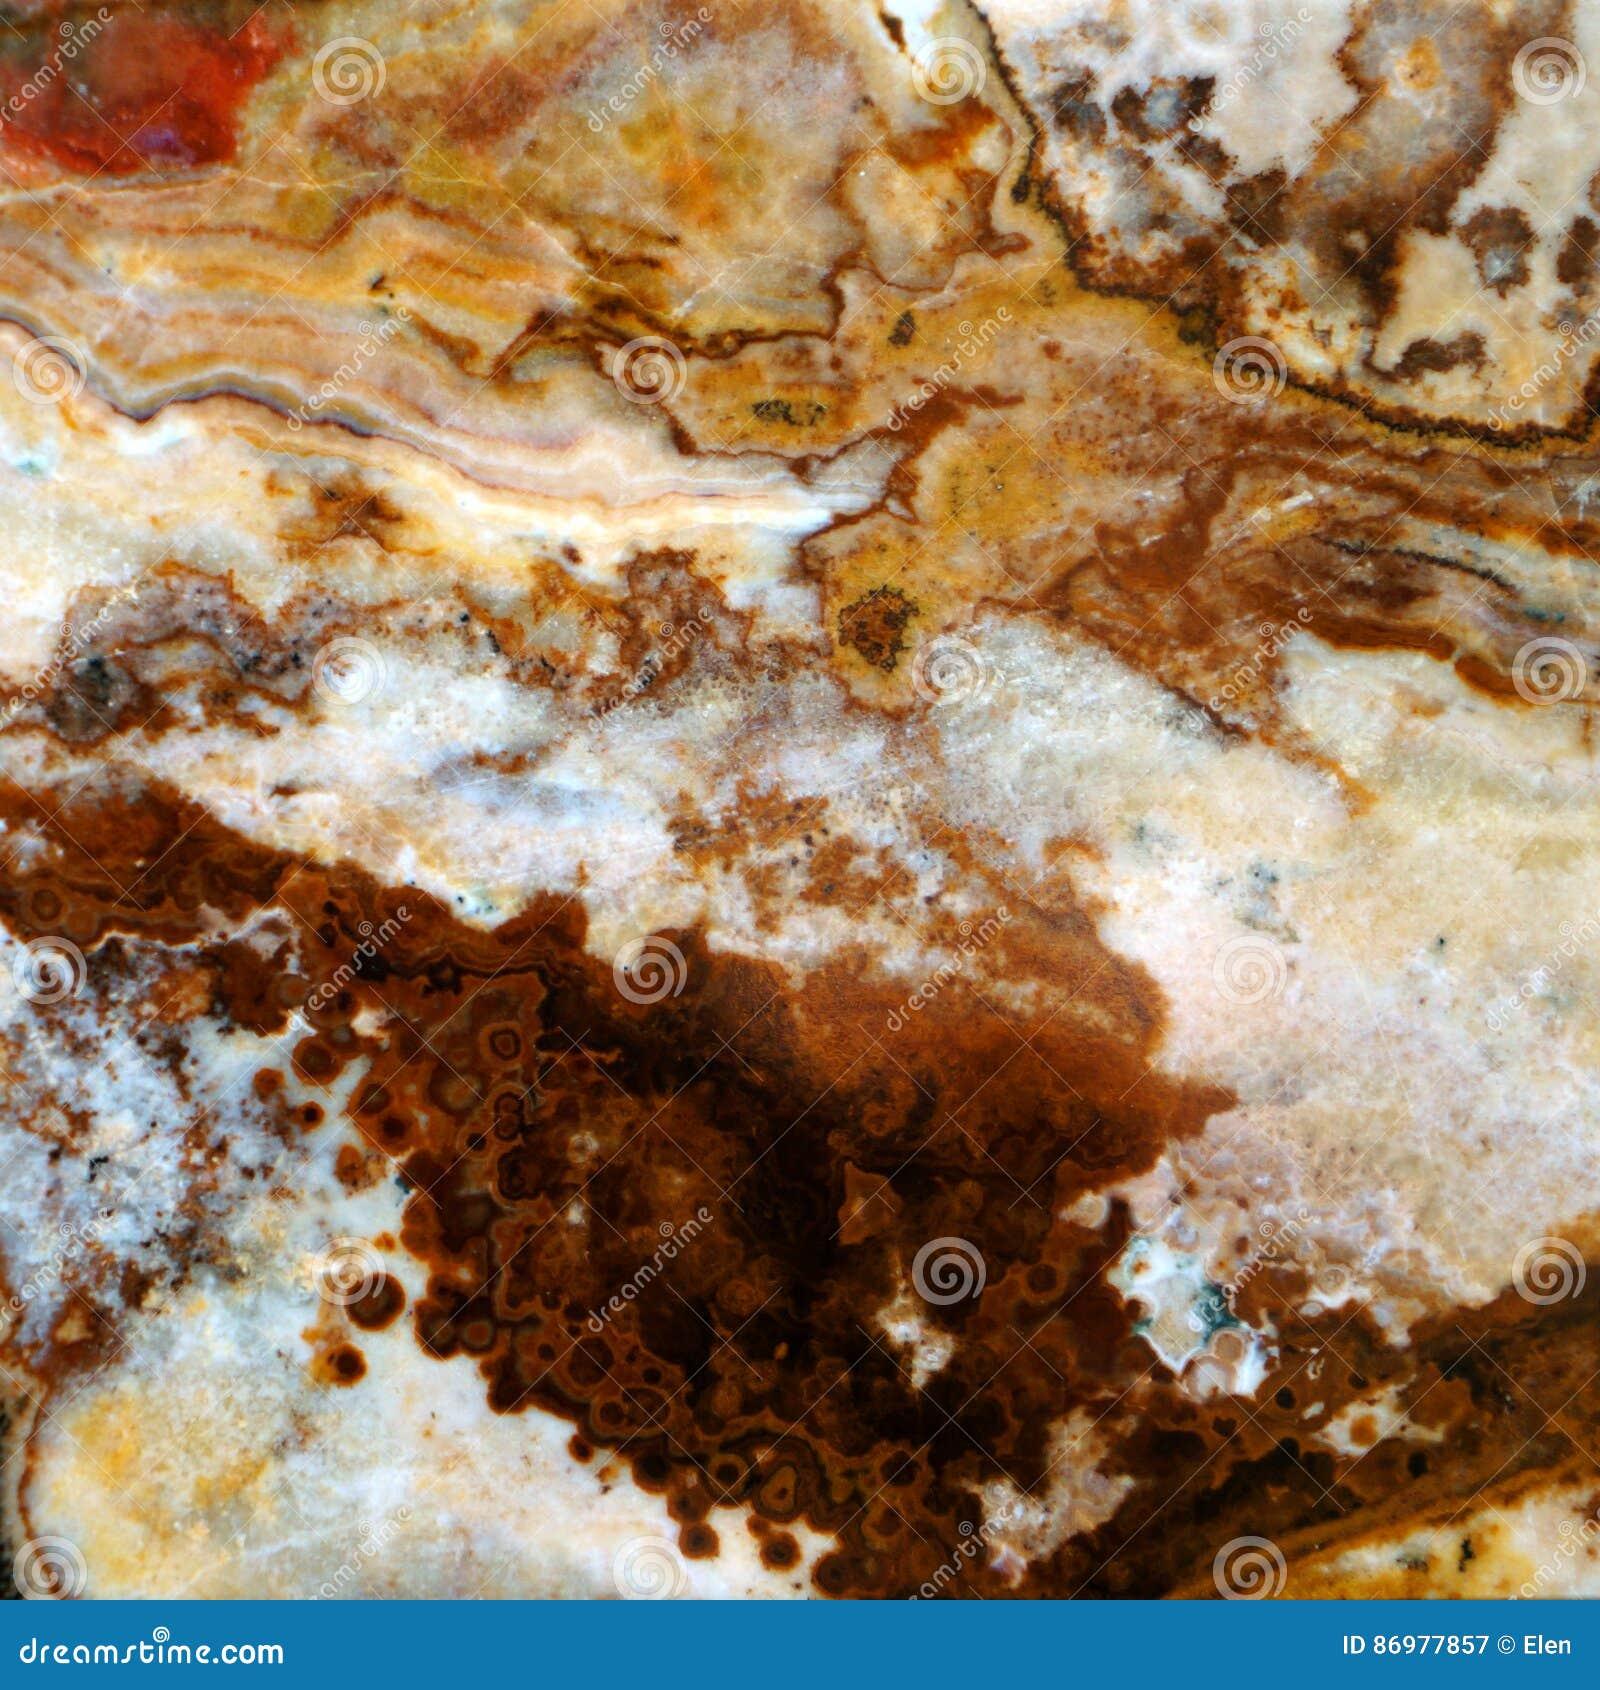 Macro texture of nature - landscape jasper